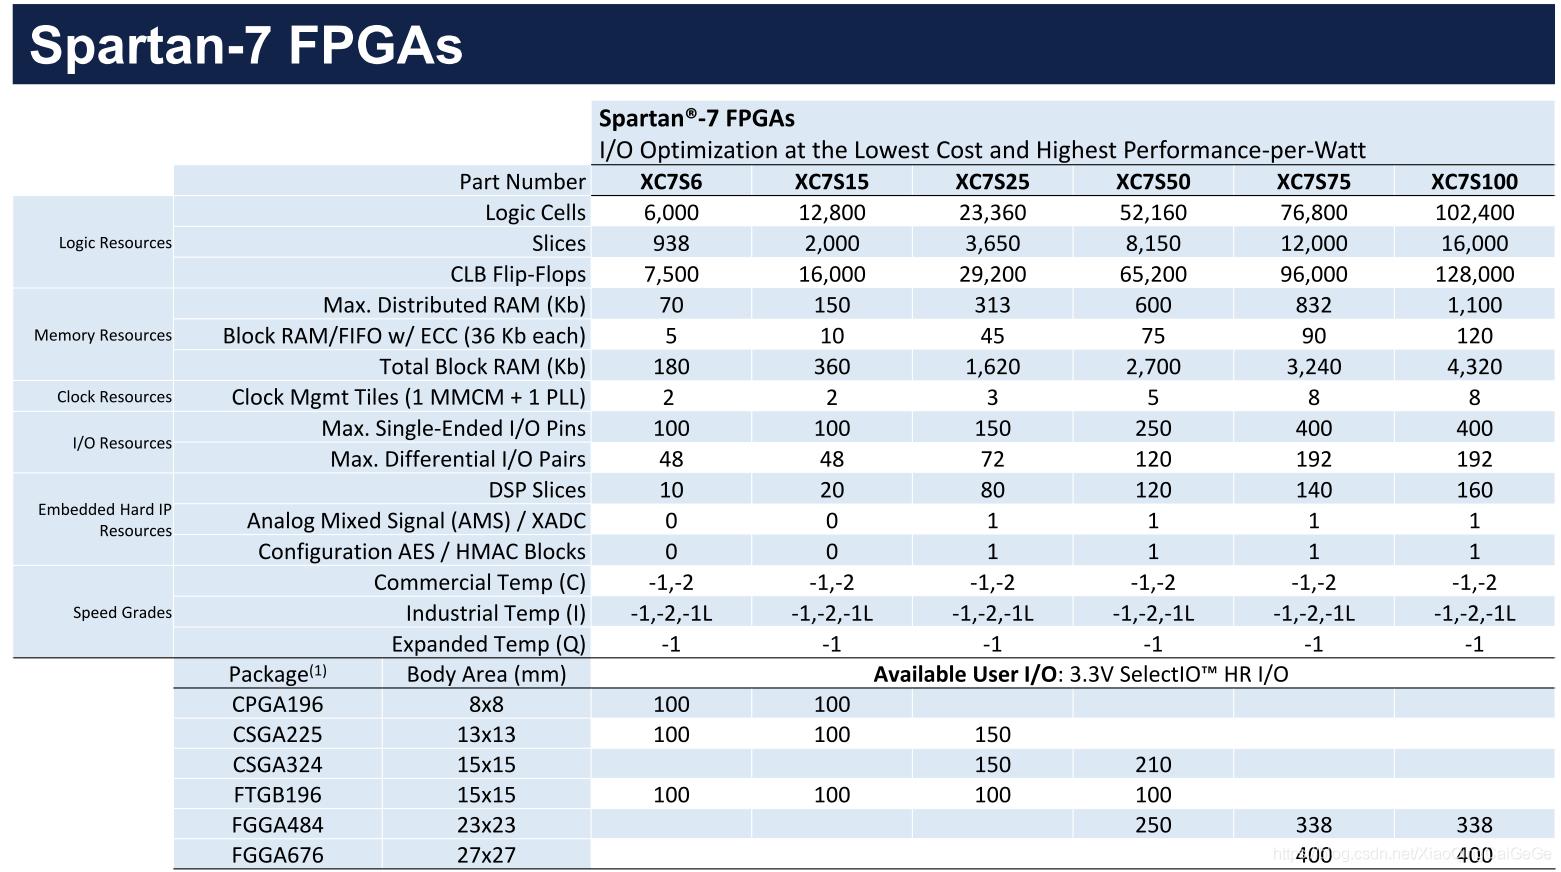 xilinx 7系列FPGA分类简介- 小青菜哥哥的博客- CSDN博客